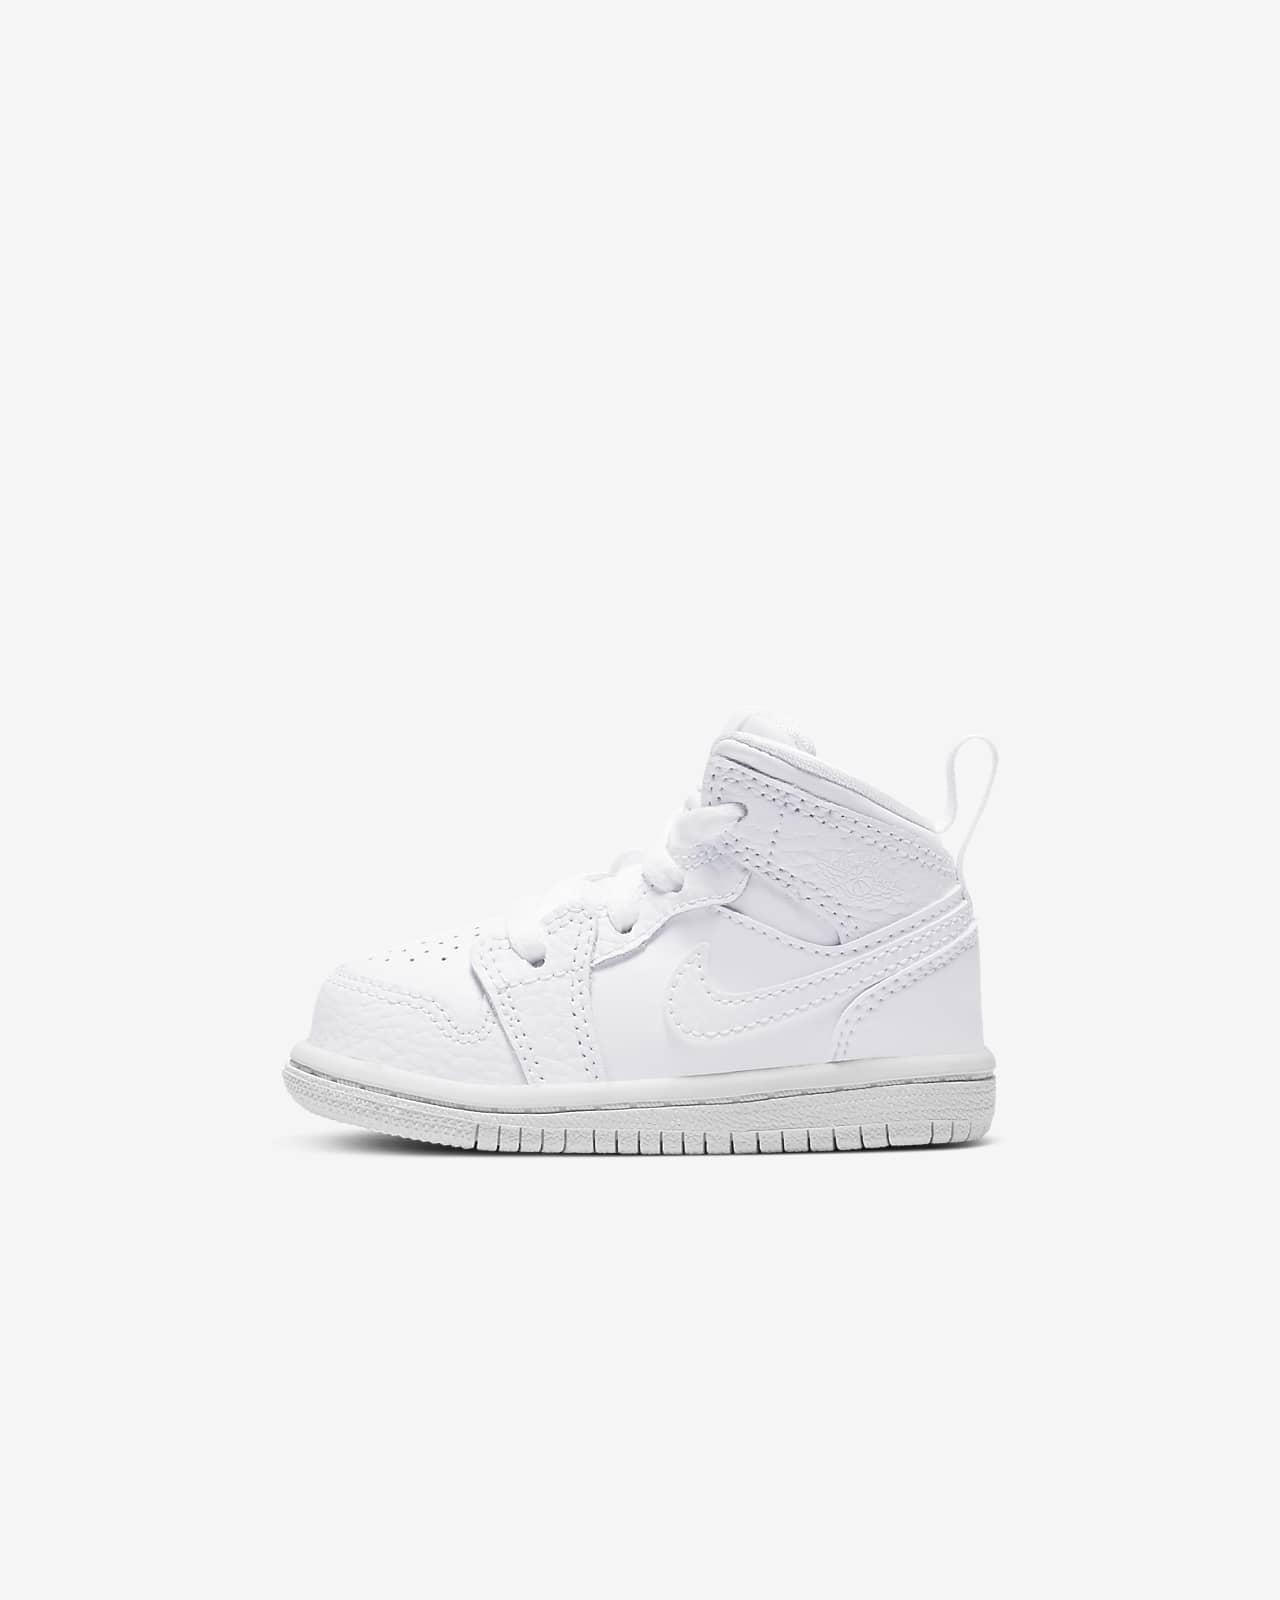 Buty dla niemowląt i maluchów Jordan 1 Mid